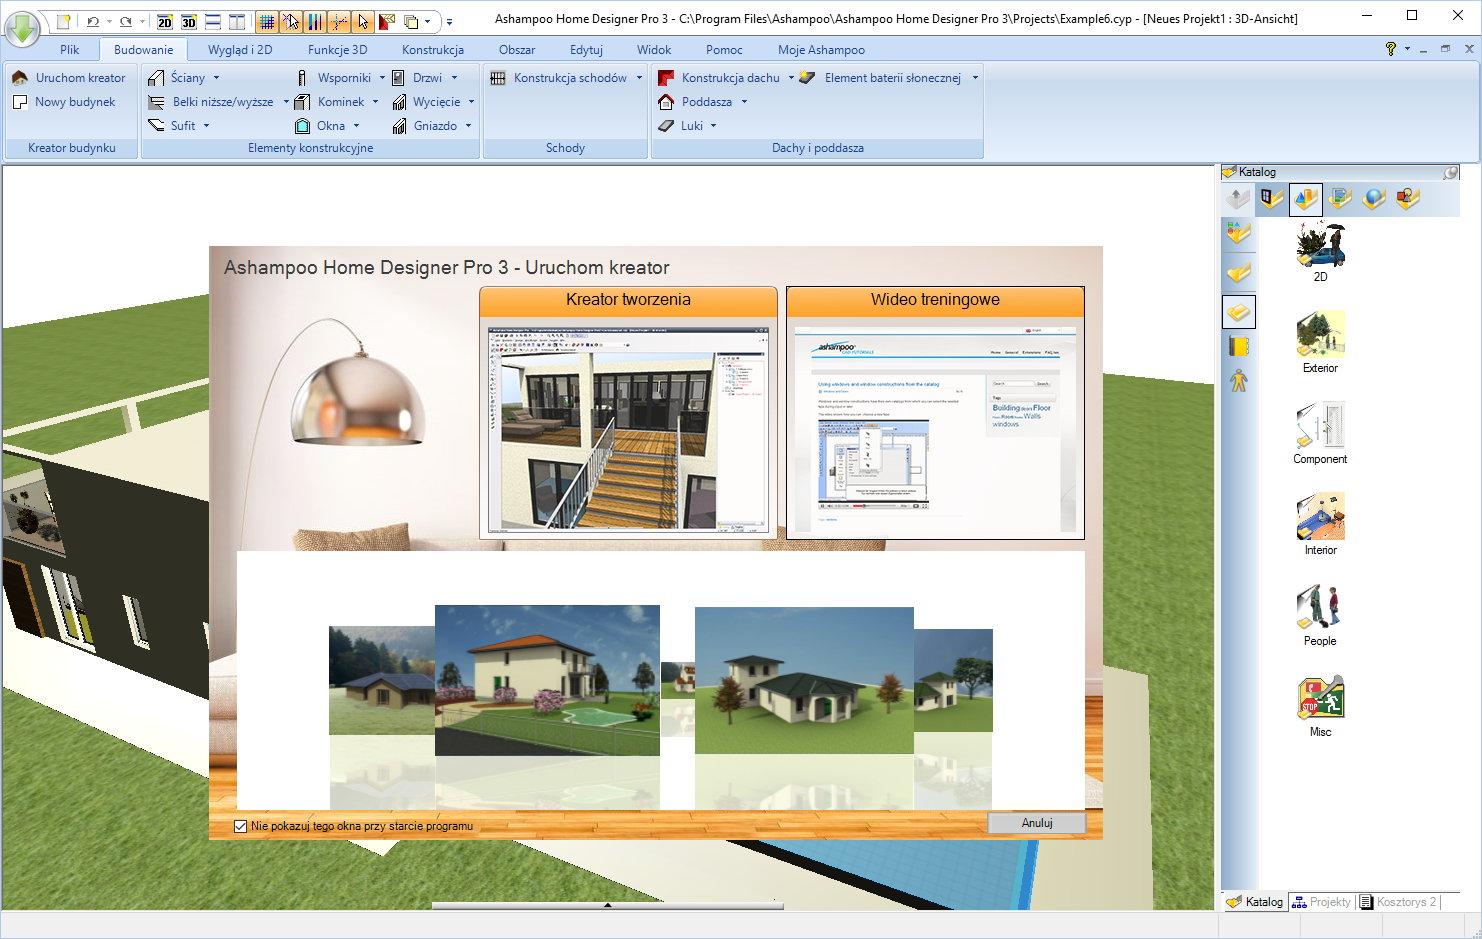 Ashampoo Home Designer Pro 3 Przegld